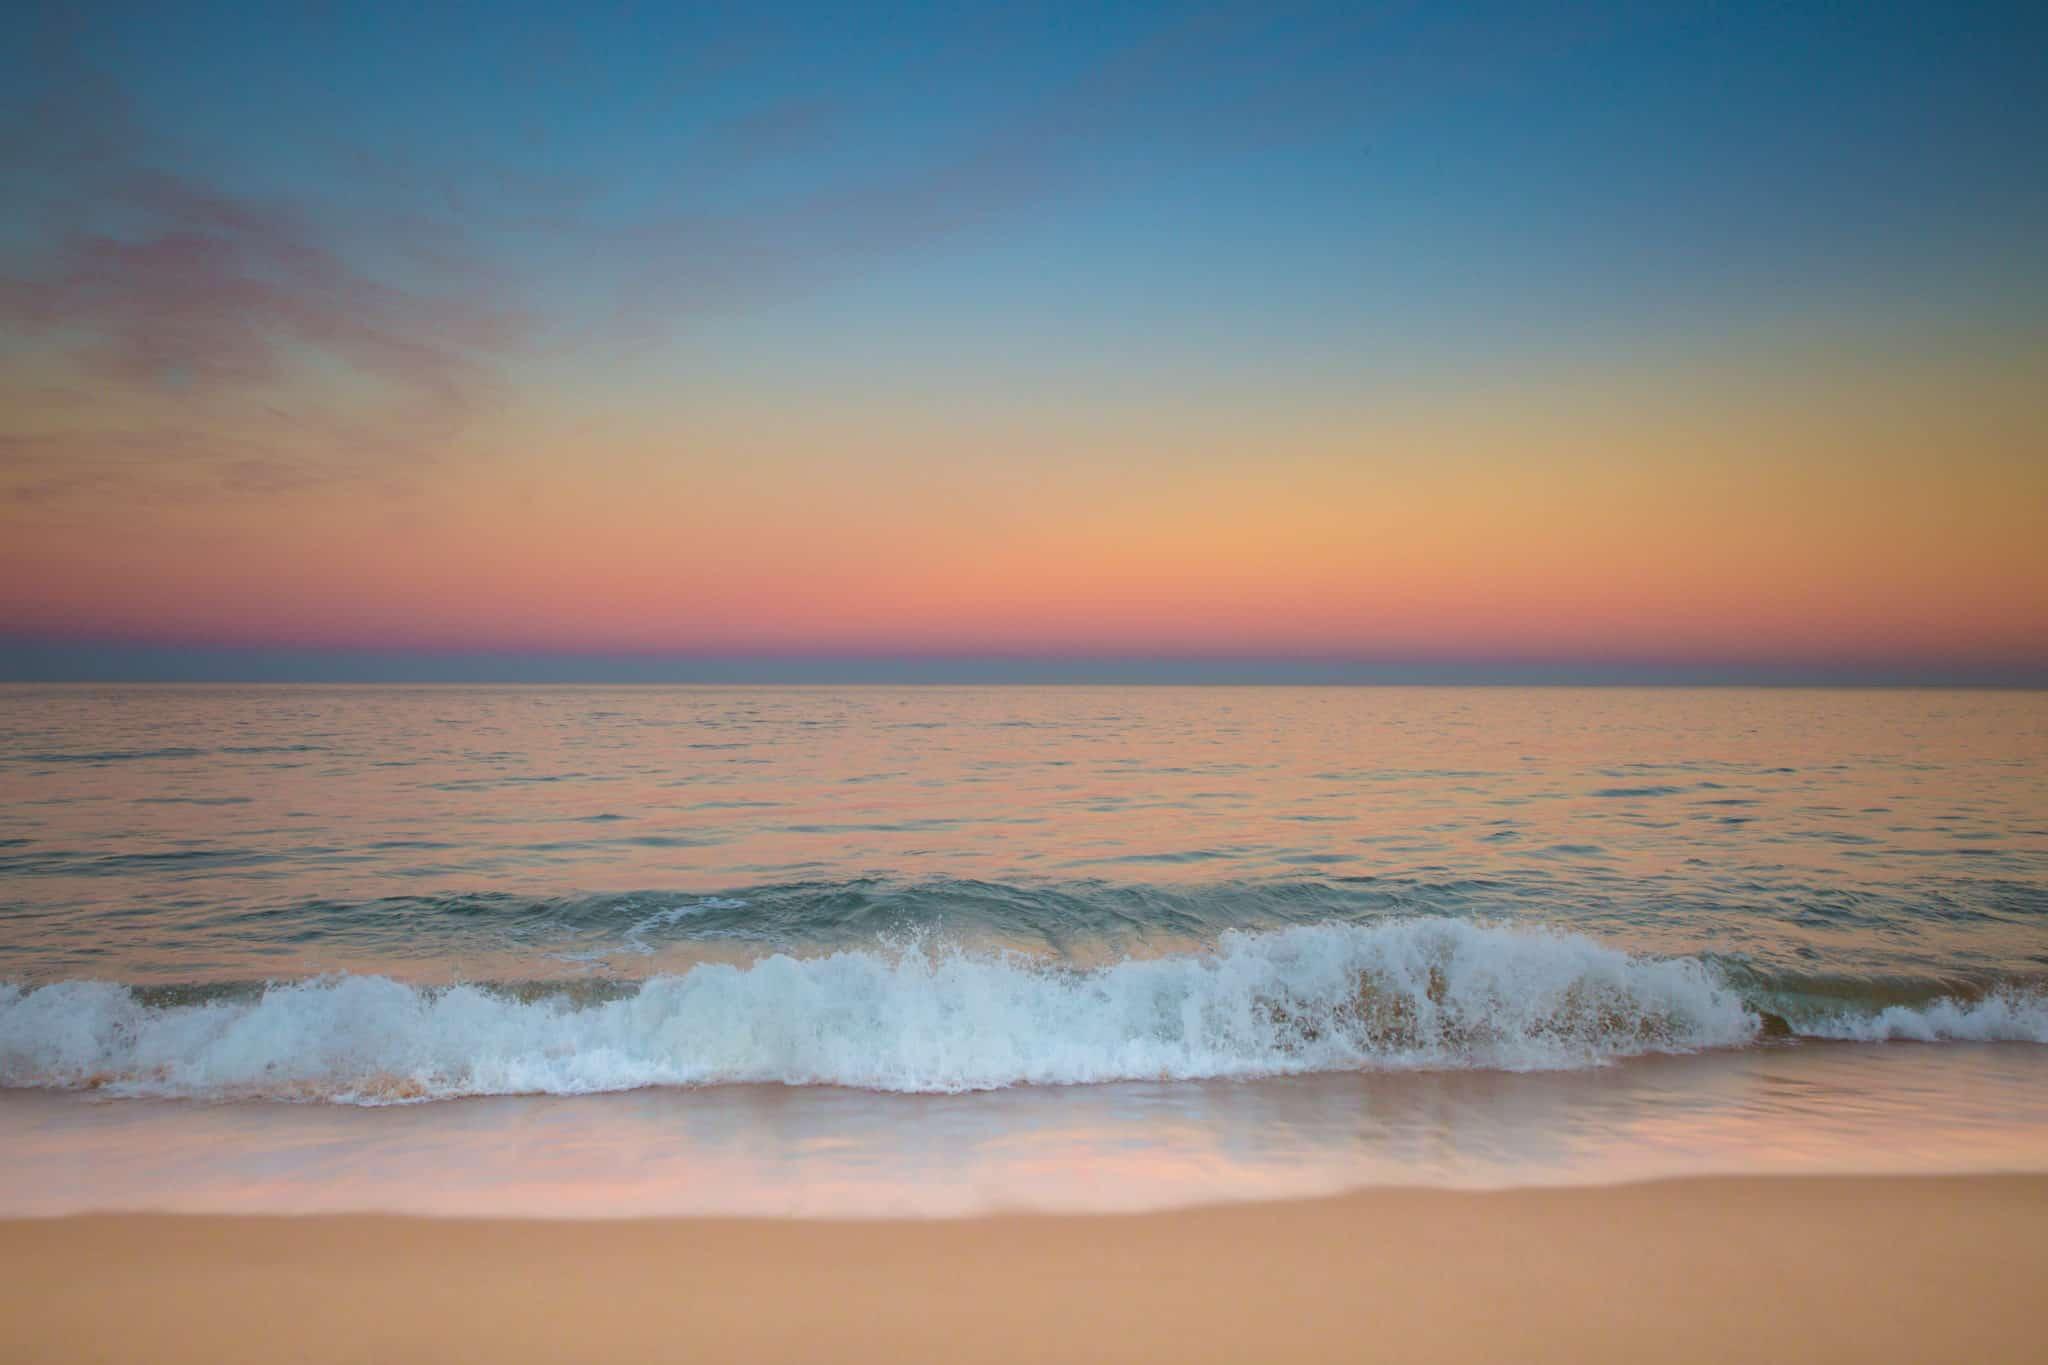 Travel With Meraki - Beach Photography tips -Wamberal Beach - NSW - Australia